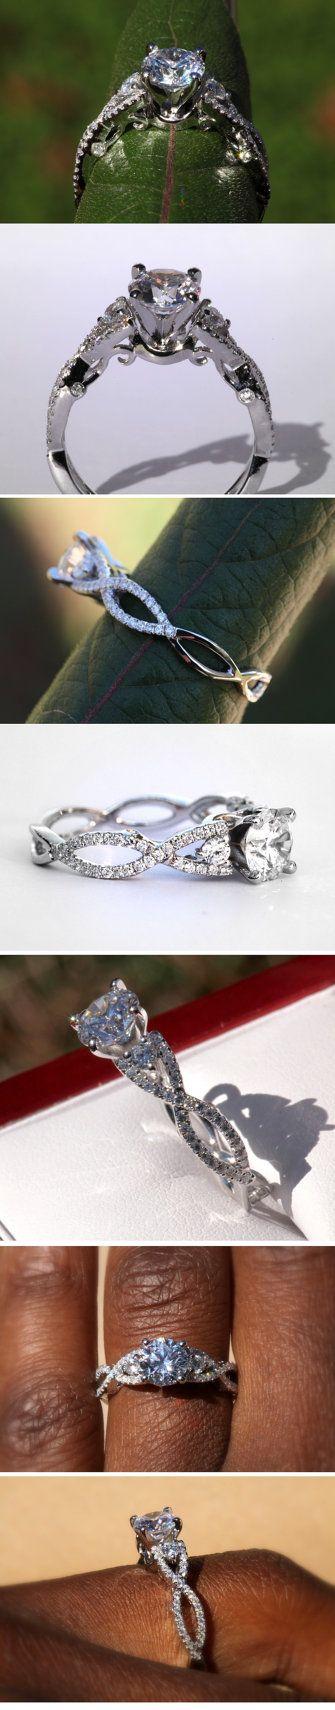 PLATINUM Diamond Engagement Ring SETTING semi by BeautifulPetra, $1850.00 MostUniqueWeddingRings